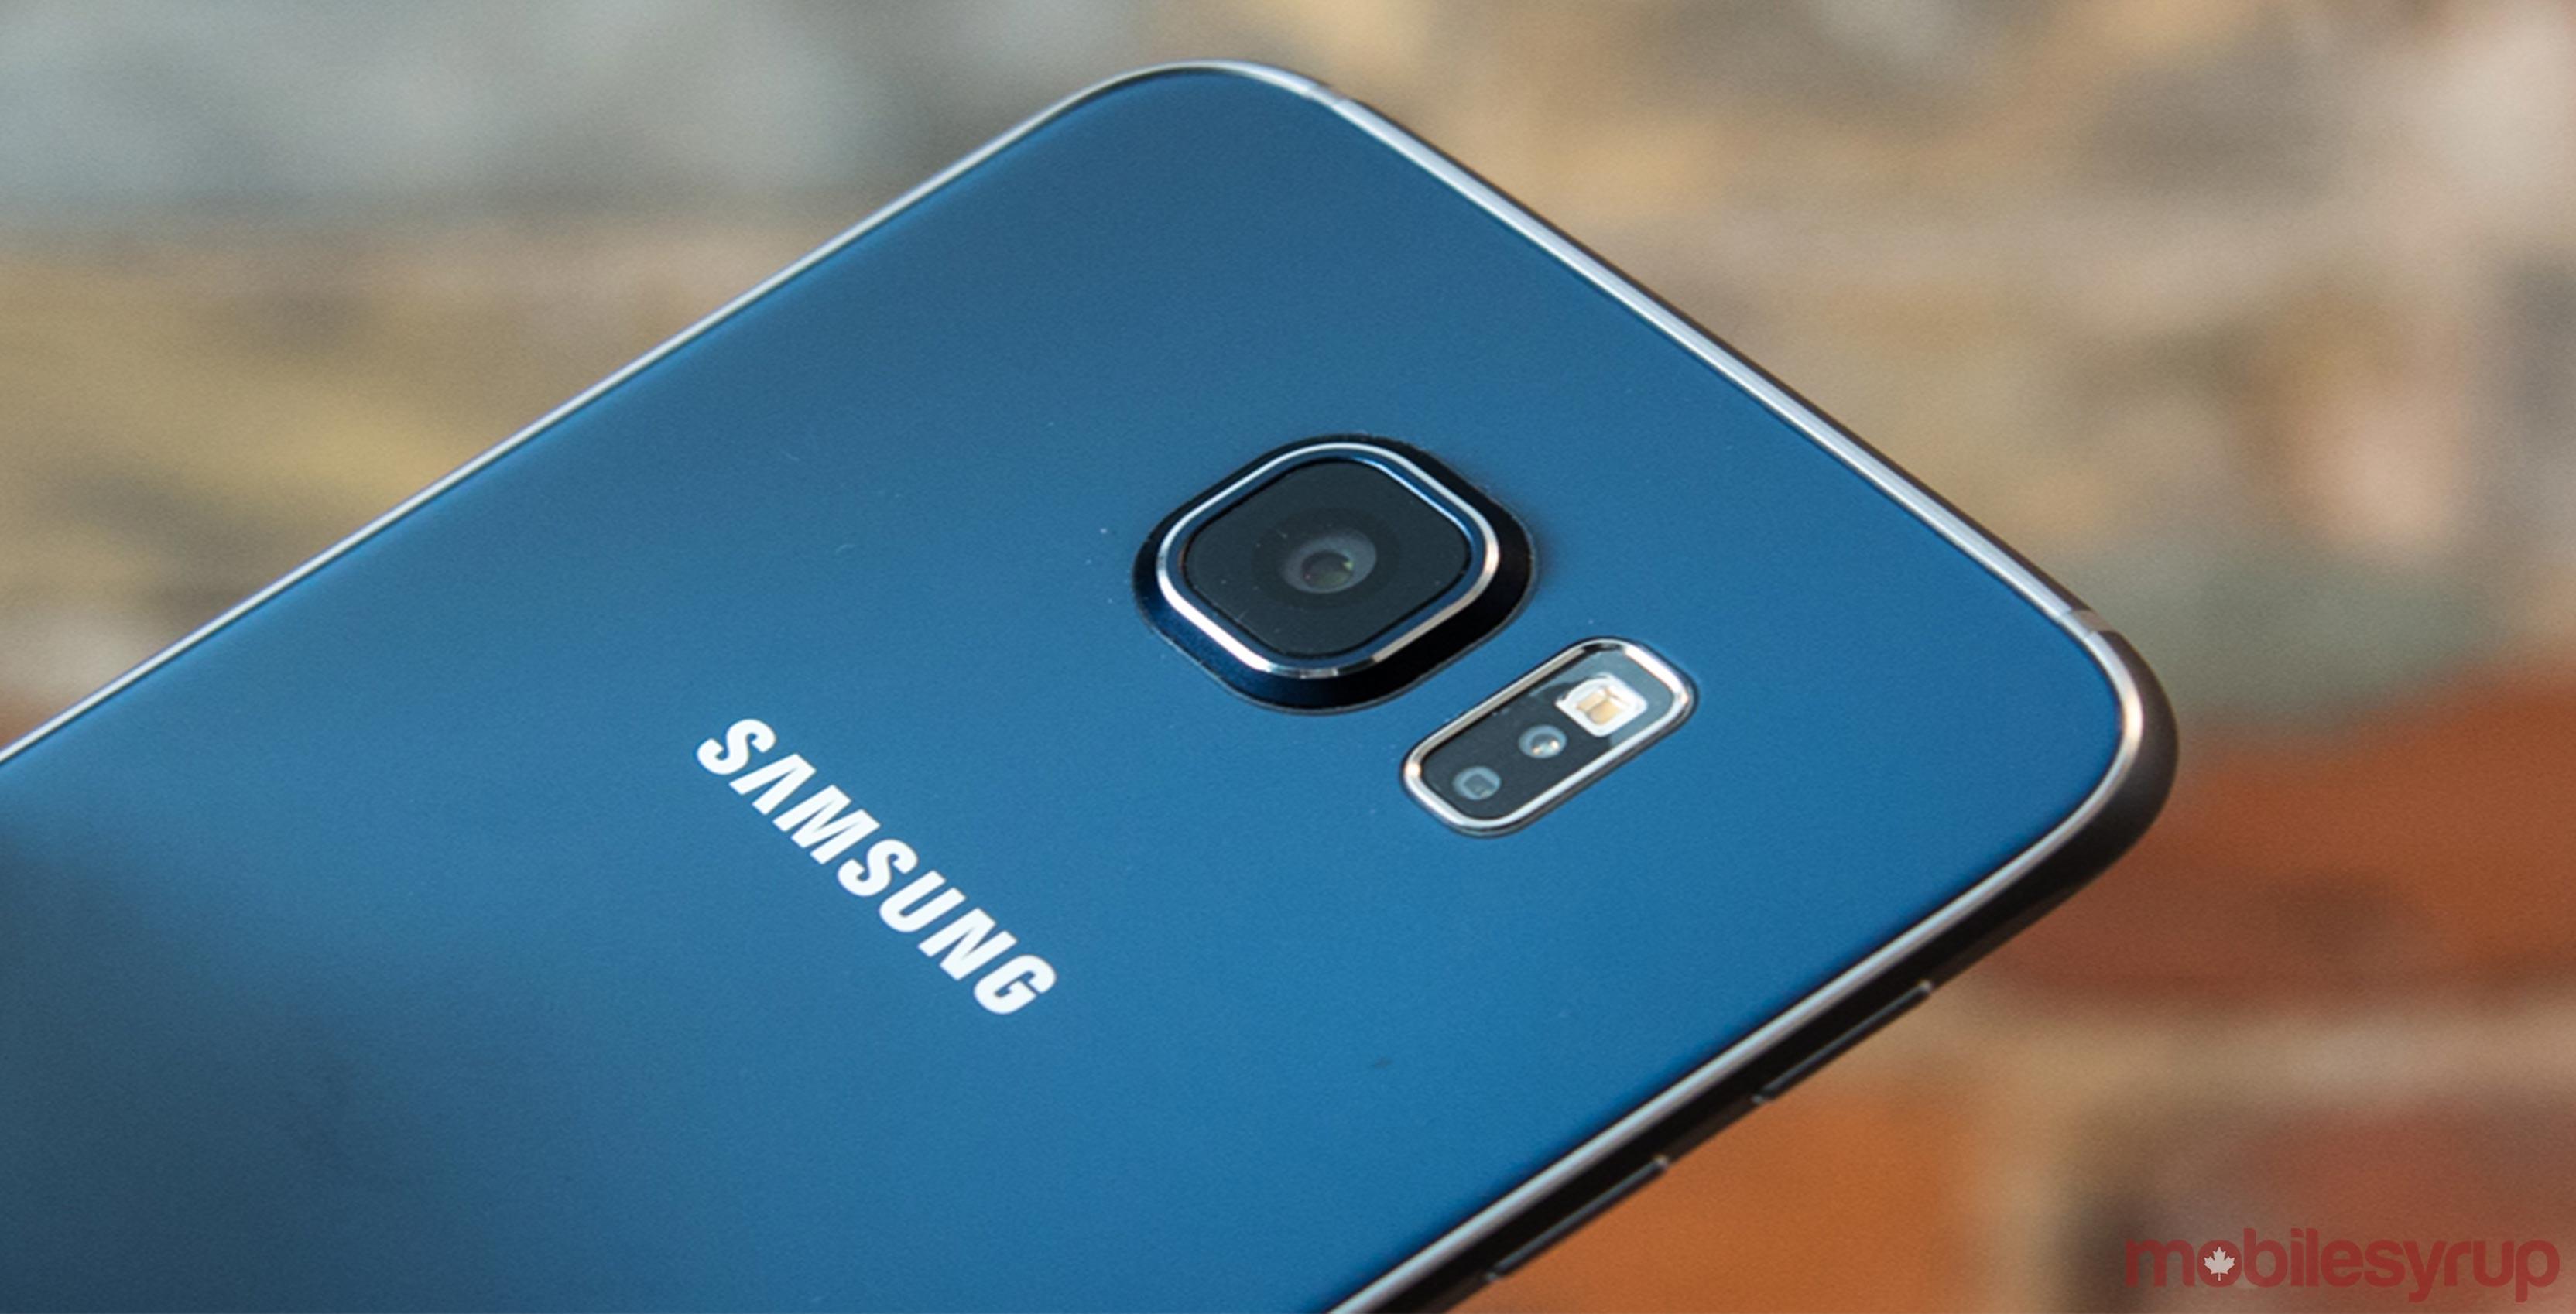 Back of Samsung Galaxy S6 smartphone